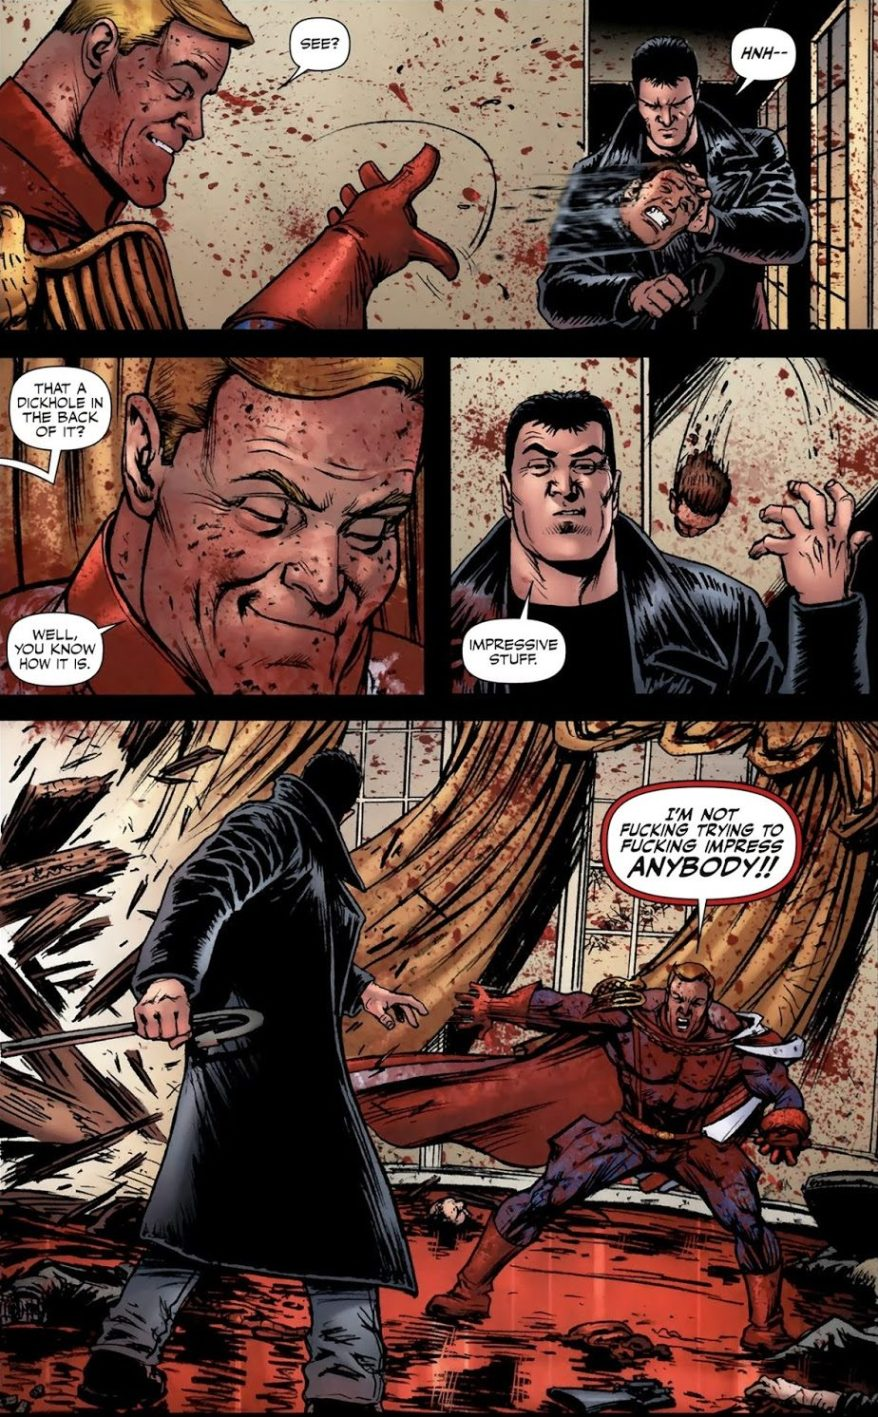 Homelander Kills The Vice President